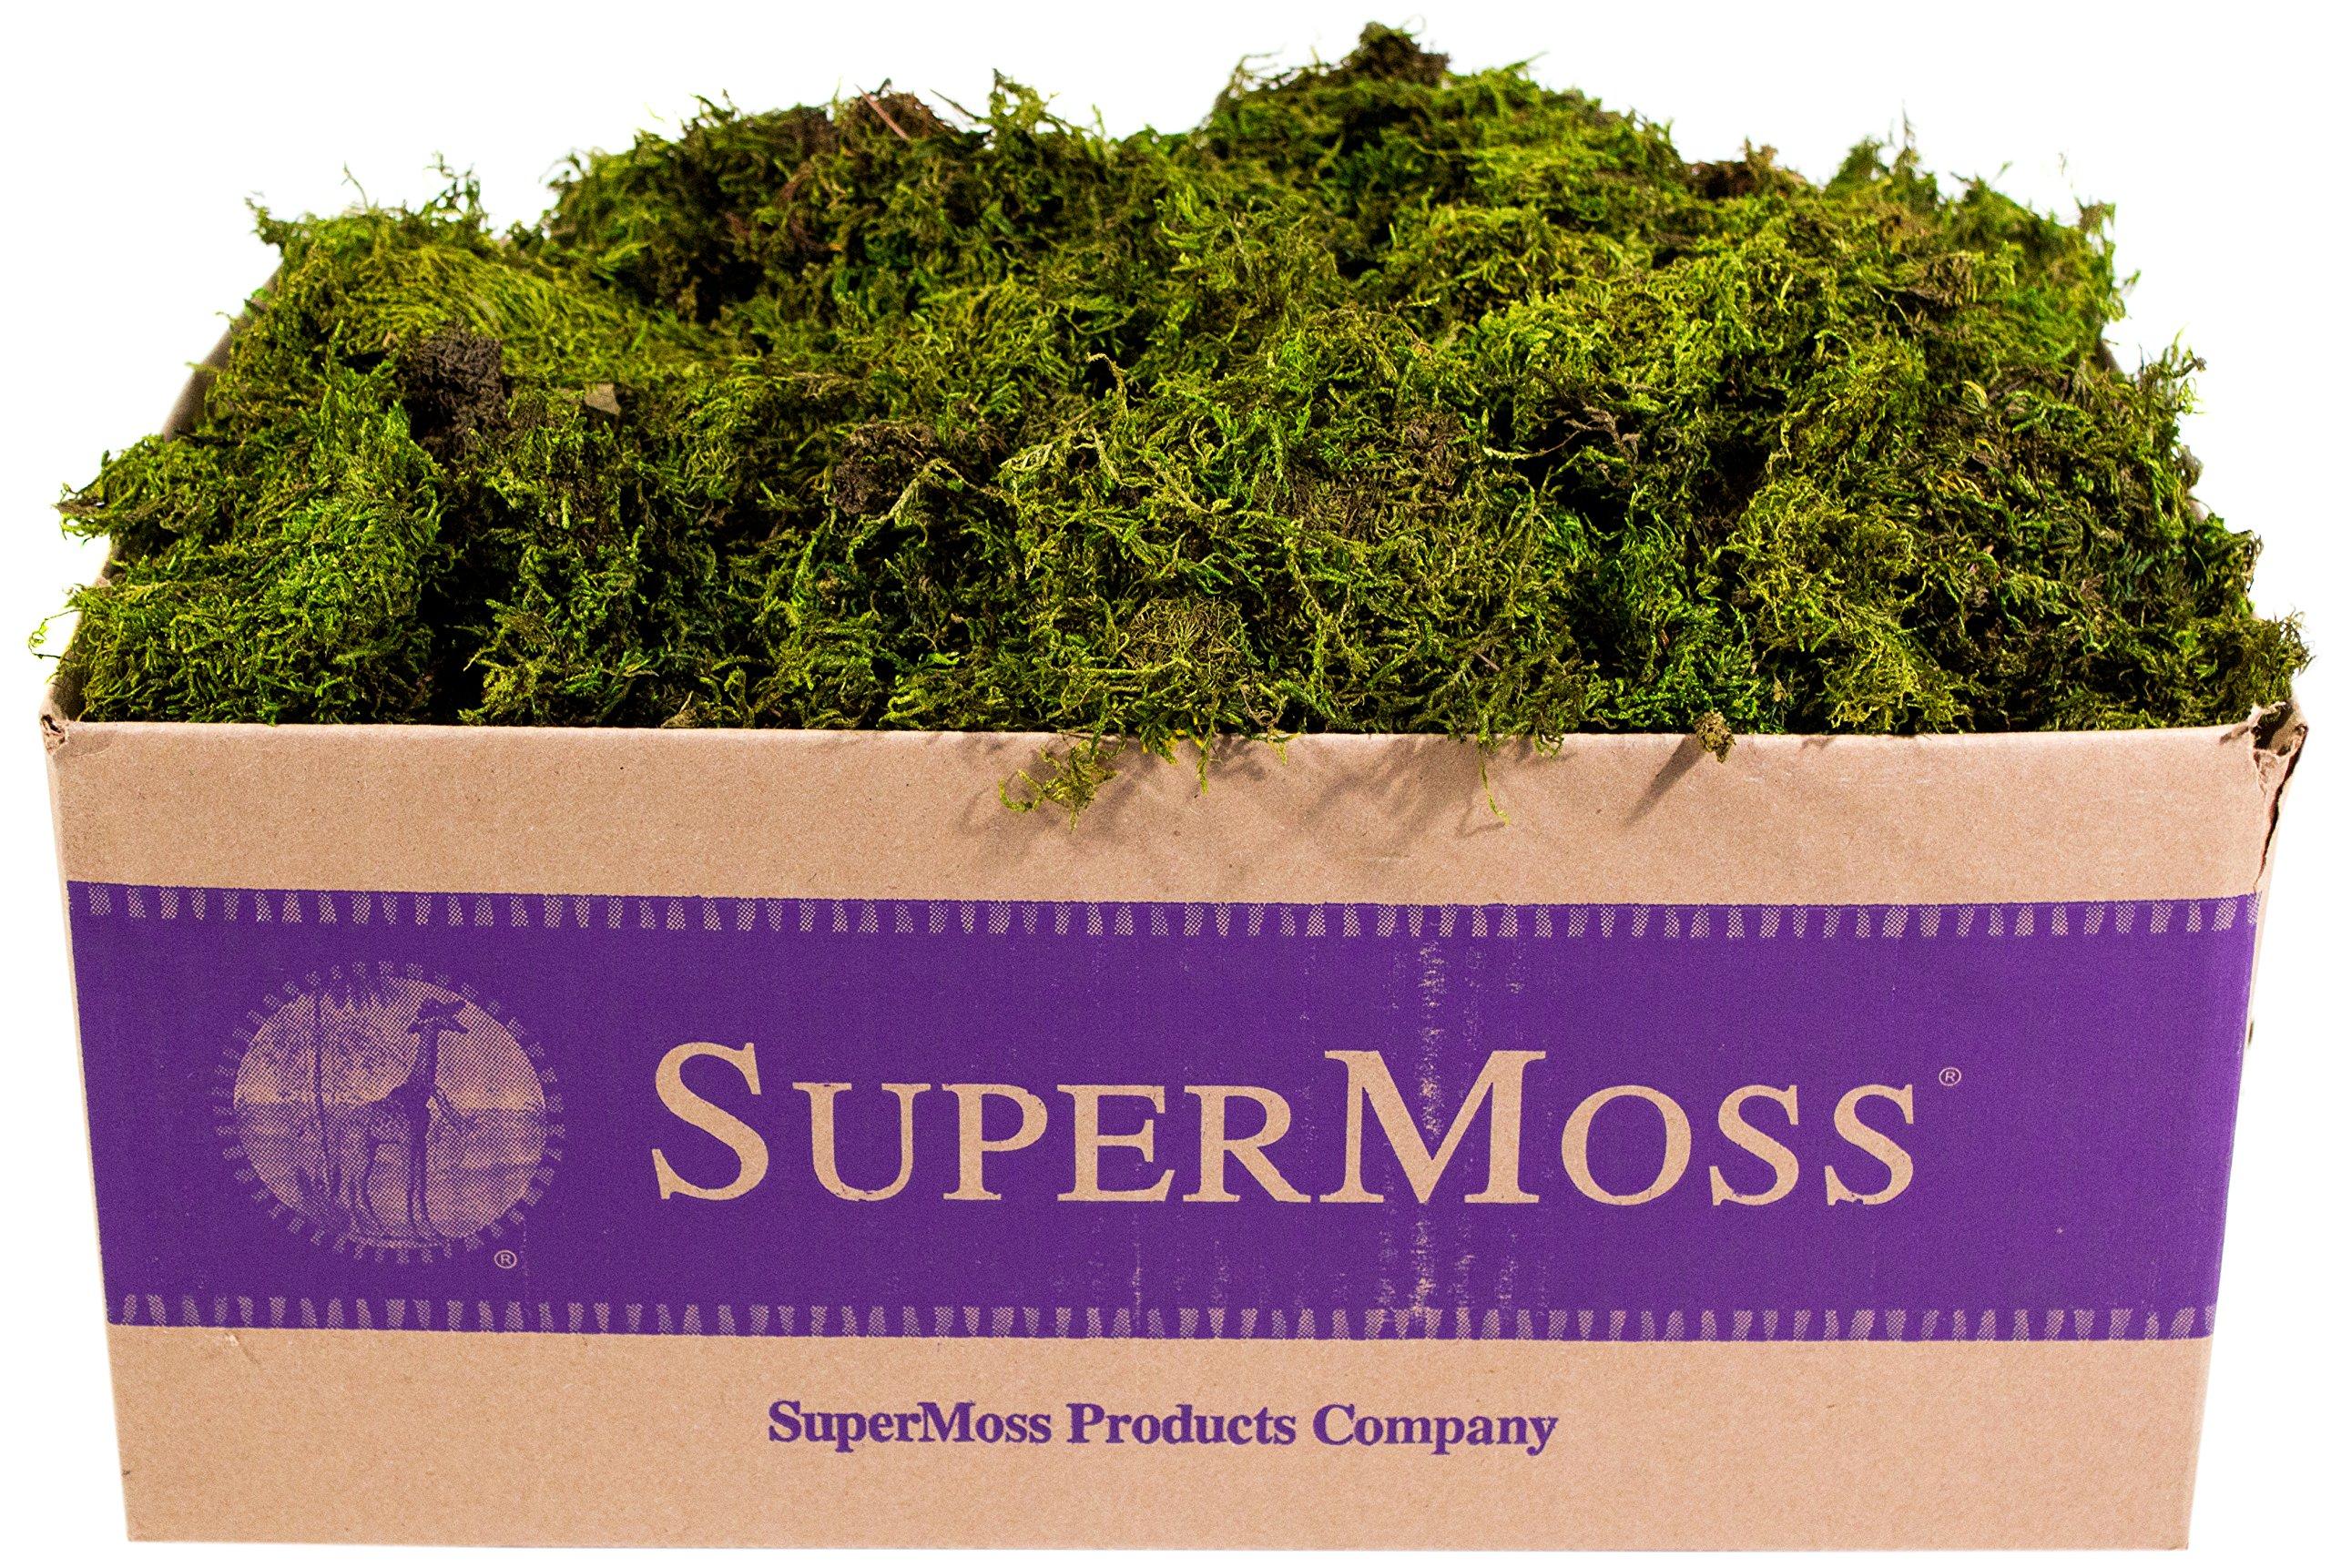 SuperMoss (22167) Sheet Moss Mini (Shredded) Preserved, Fresh Green, 3lbs by Super Moss